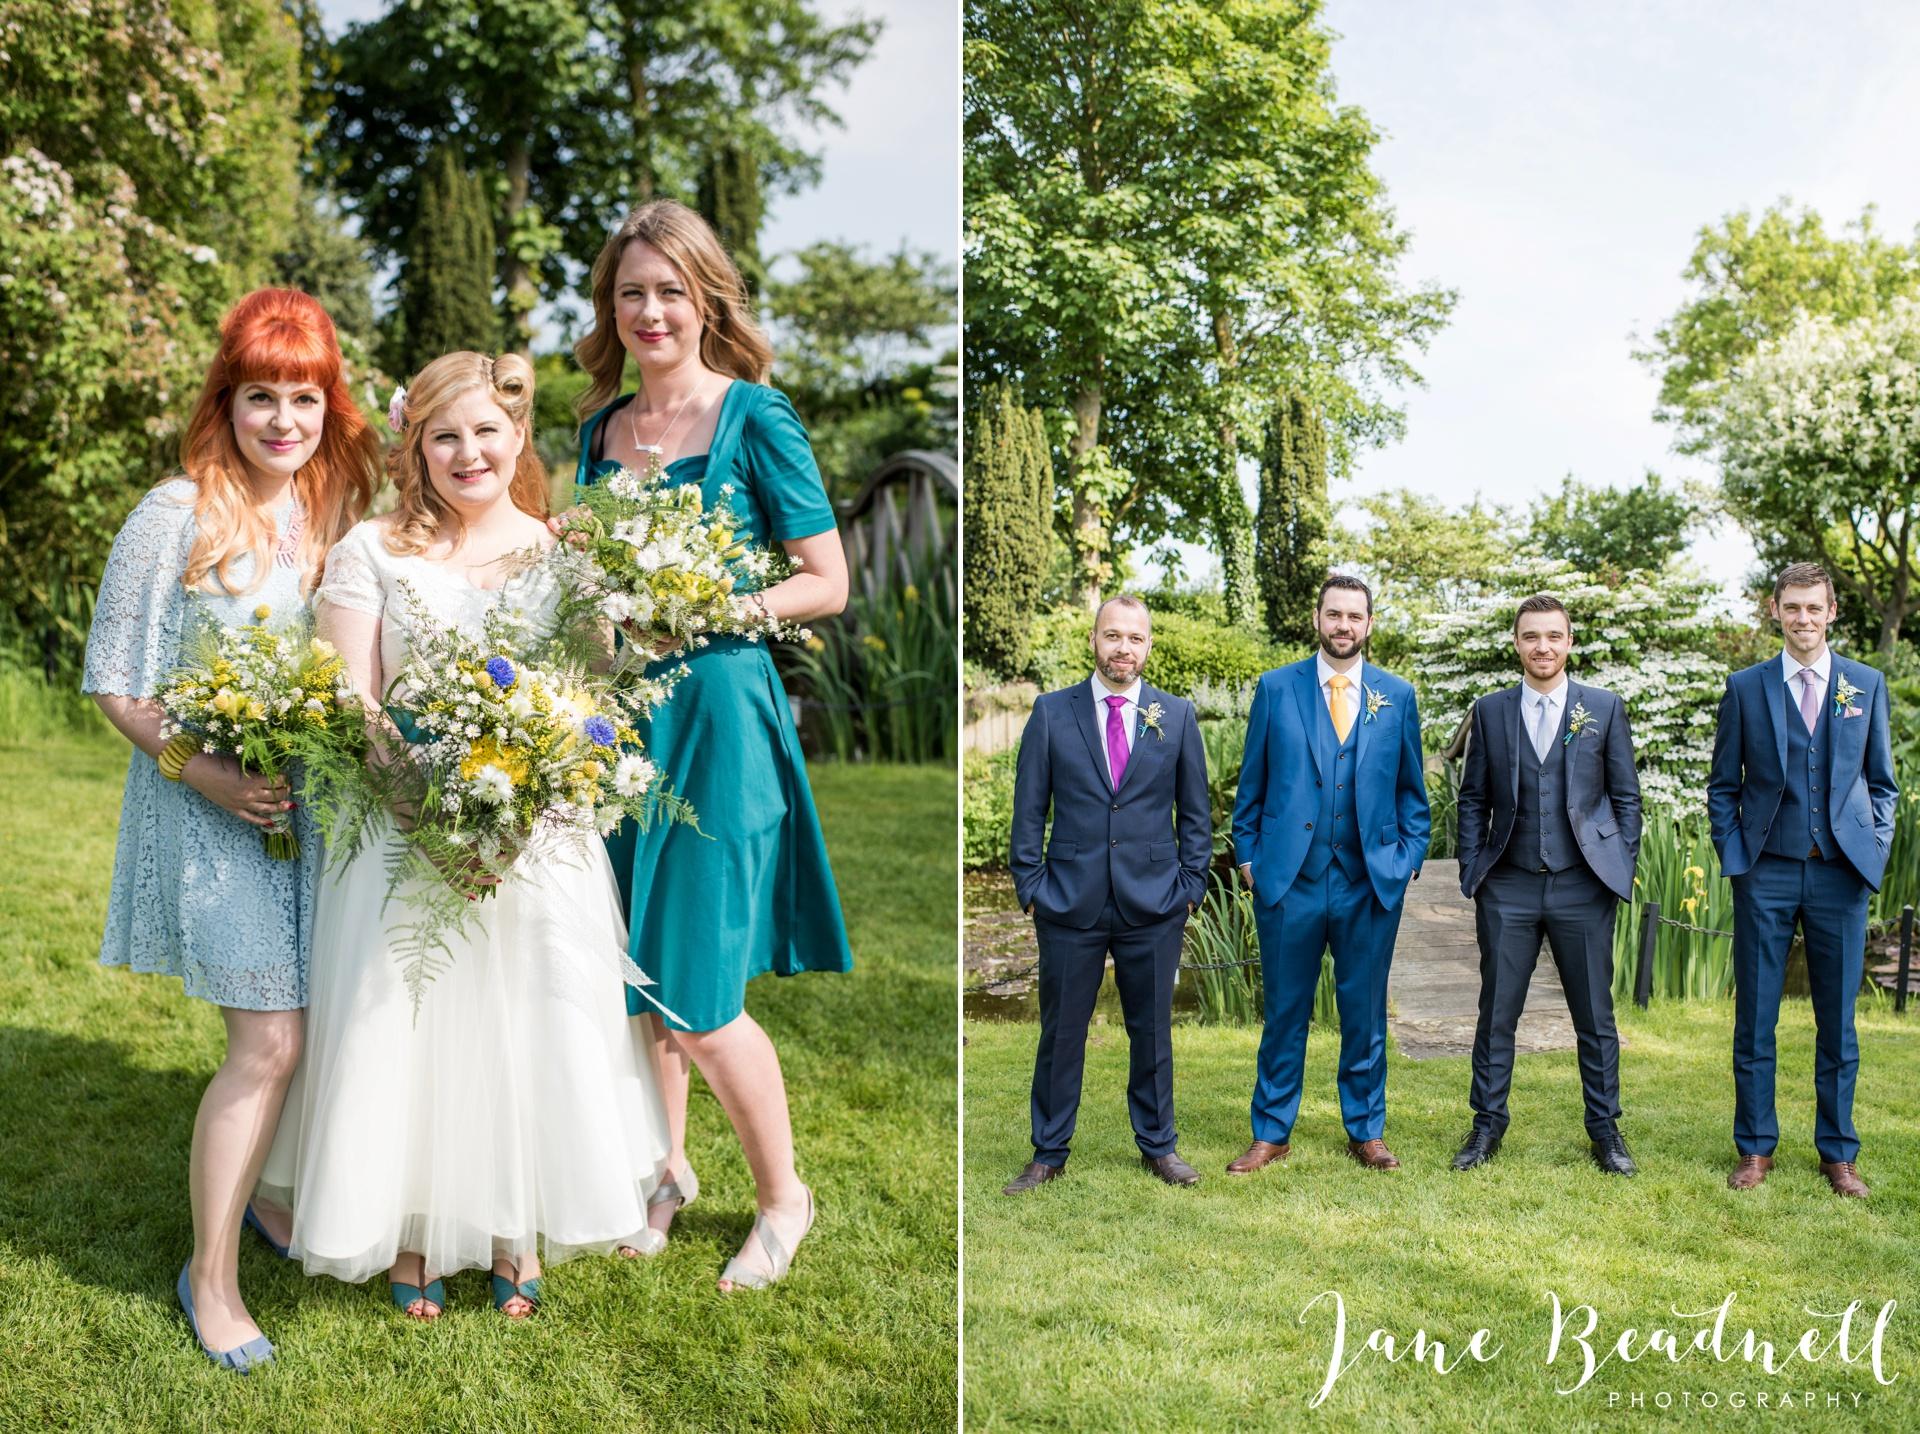 South Farm Wedding photography Hertfordshire by Jane Beadnell Photography fine art wedding photographer_0102